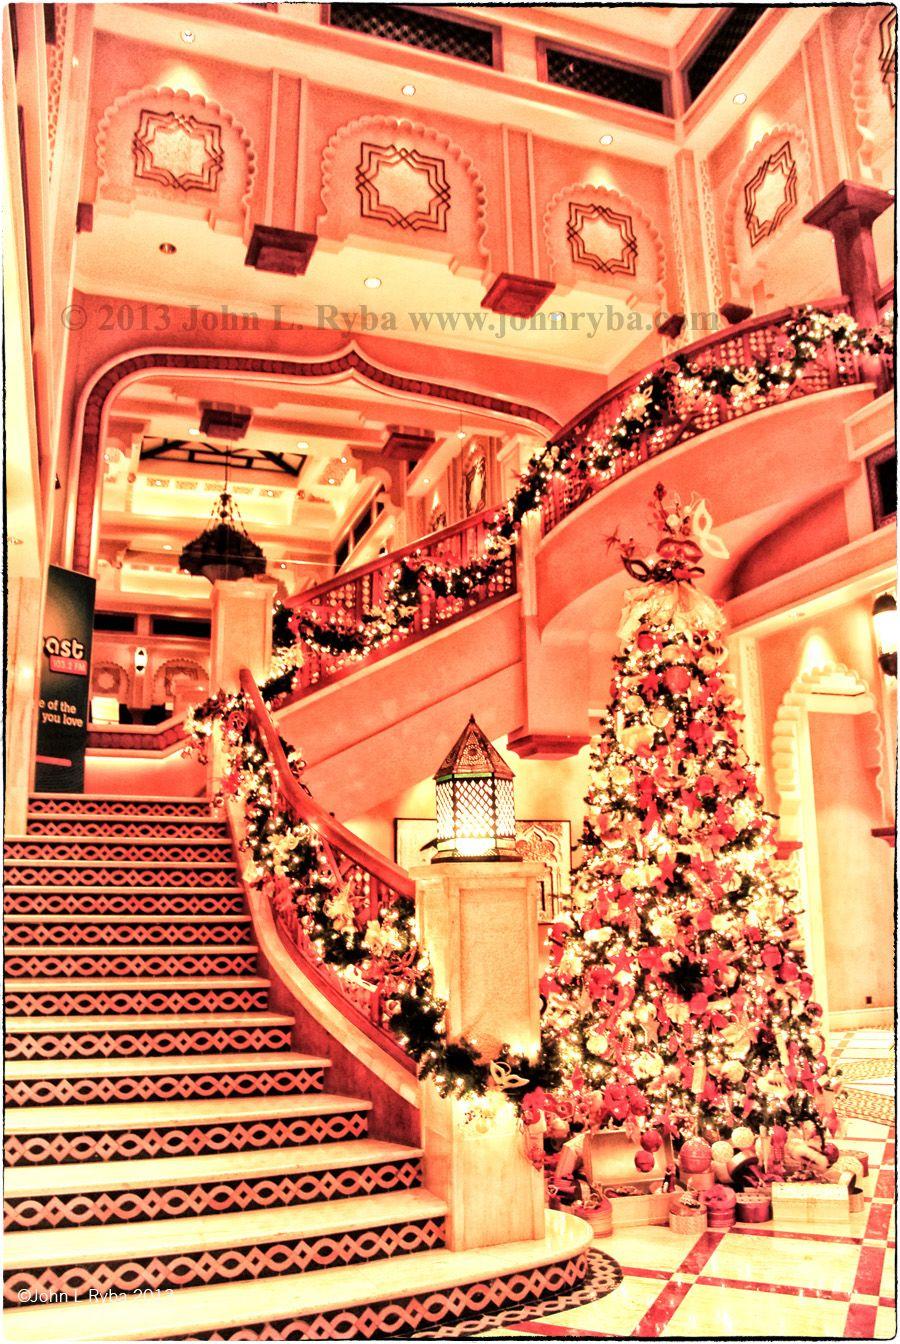 John L Ryba Travel Photography Christmas Abroad Christmas Worldwide Dubai Travel